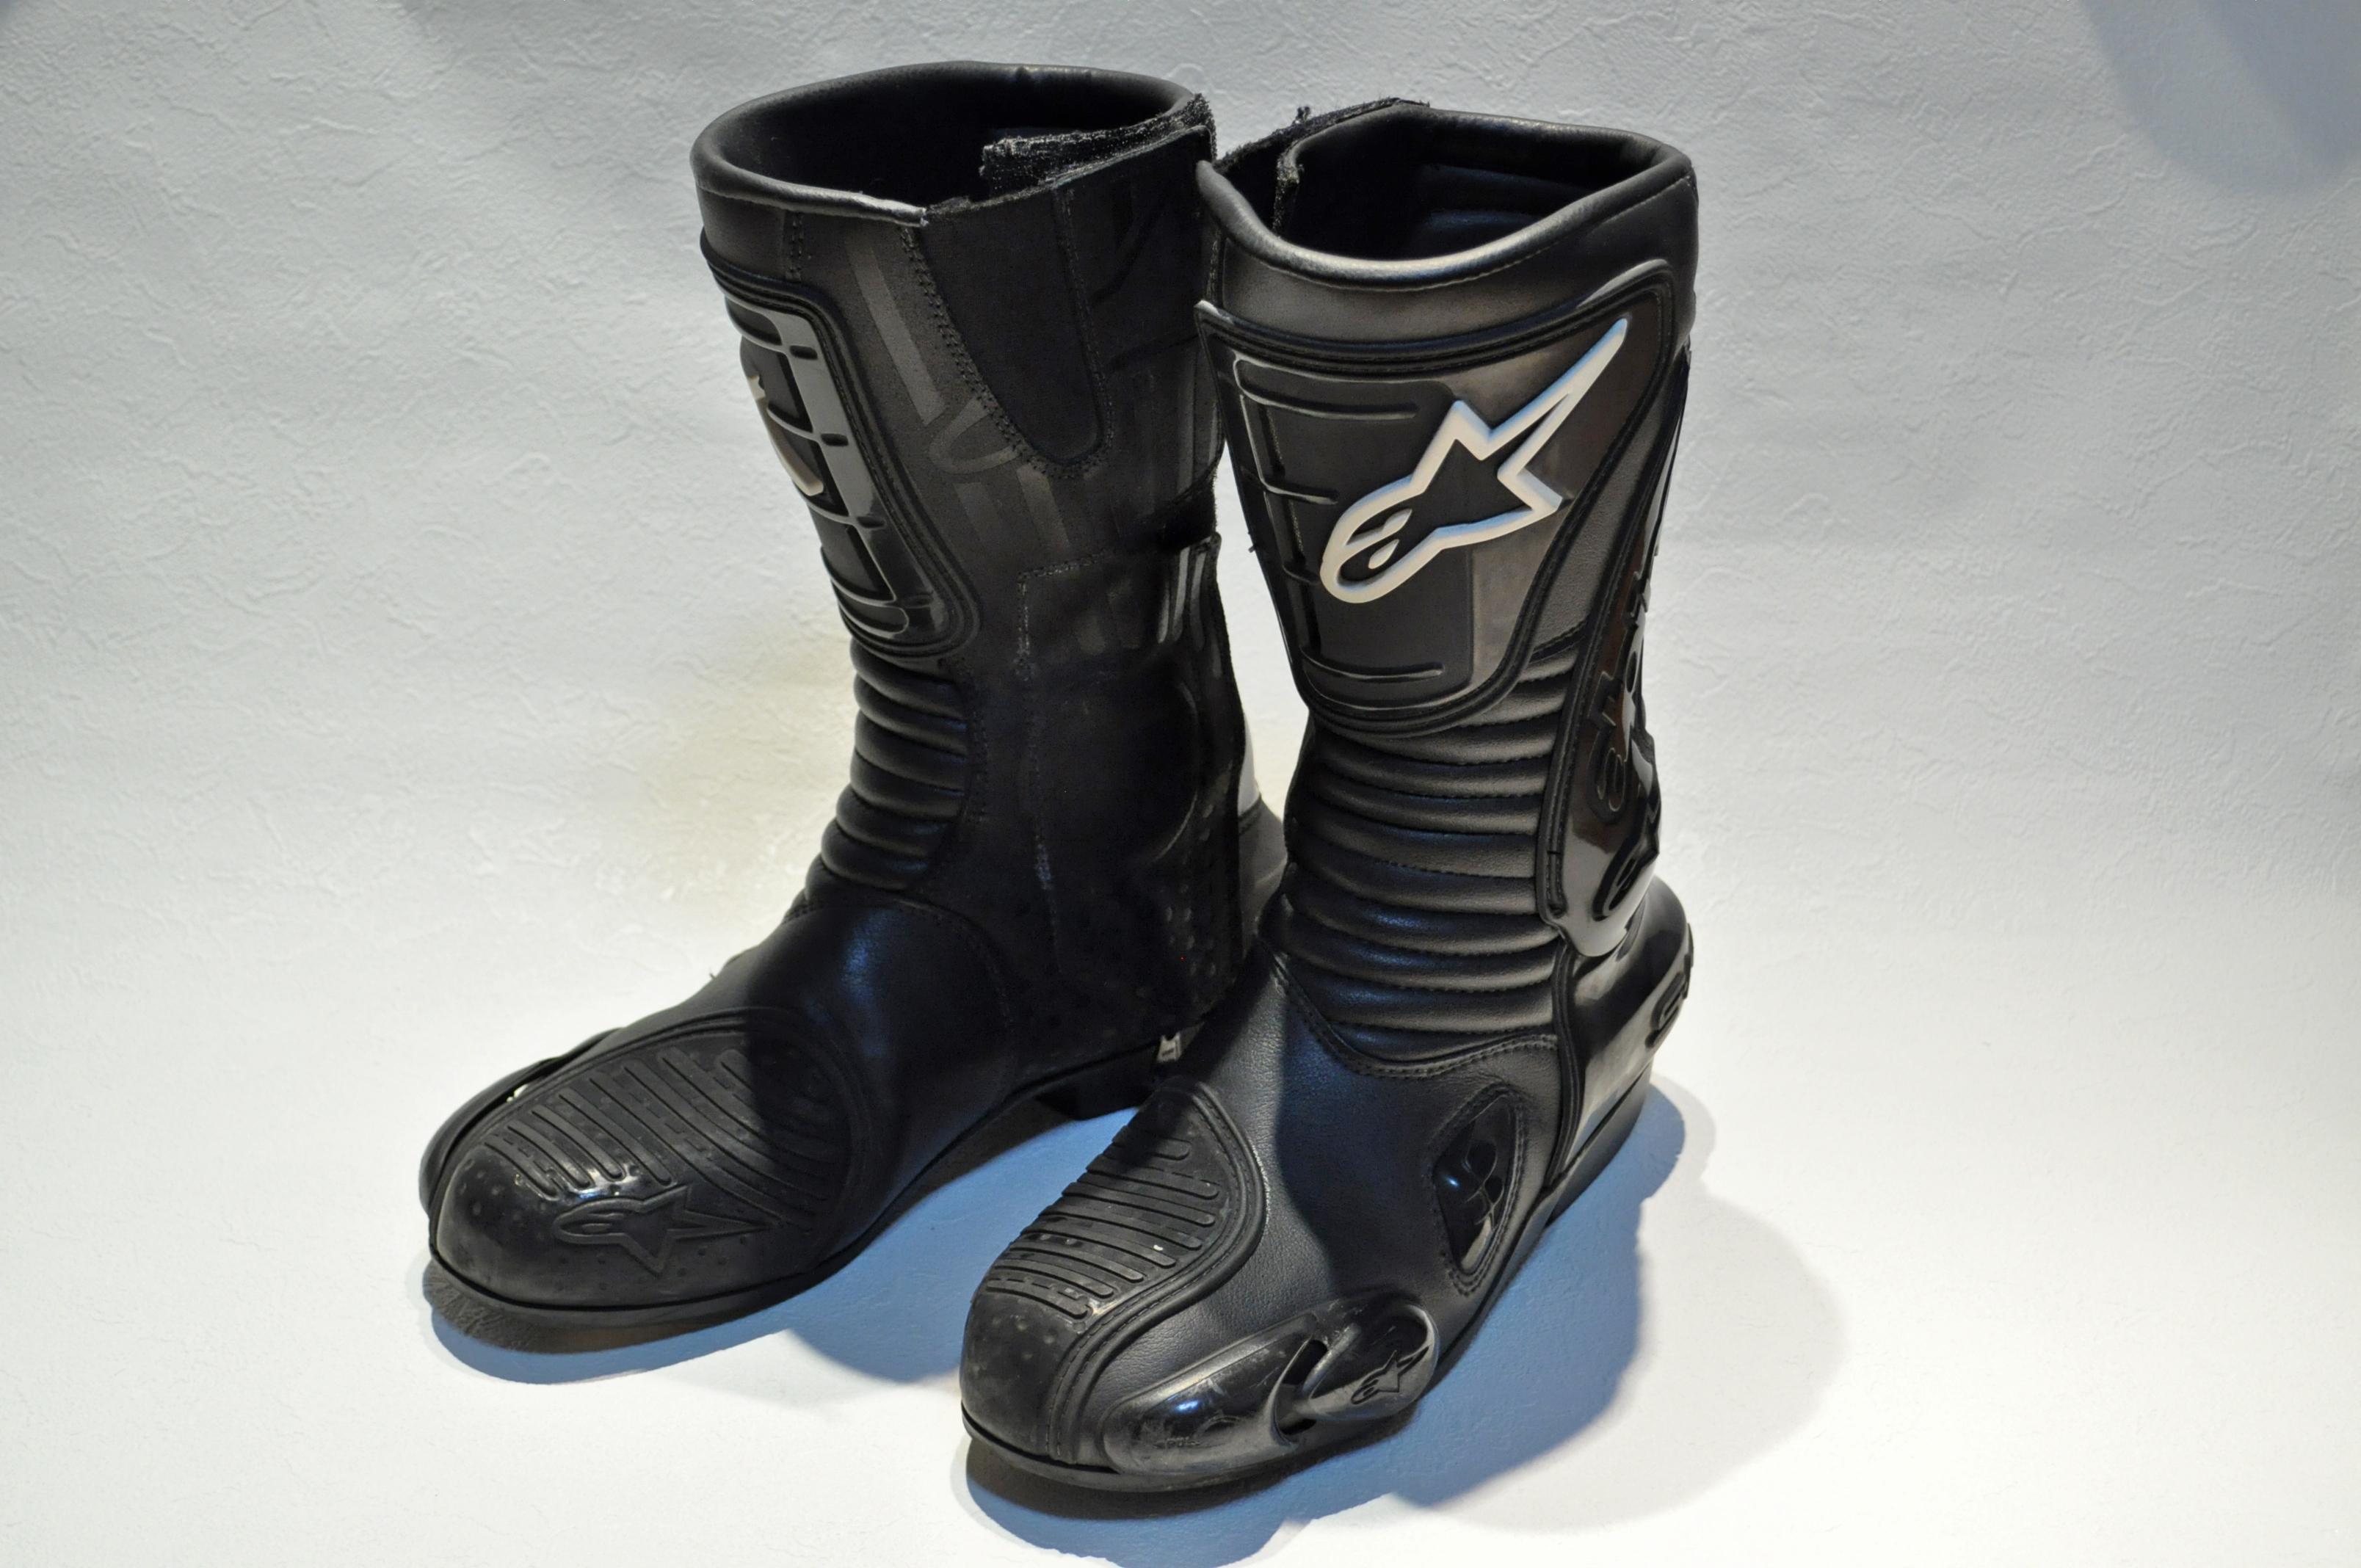 File:Alpinestars S-MX Motorcycle boots.jpg - Wikimedia Commons